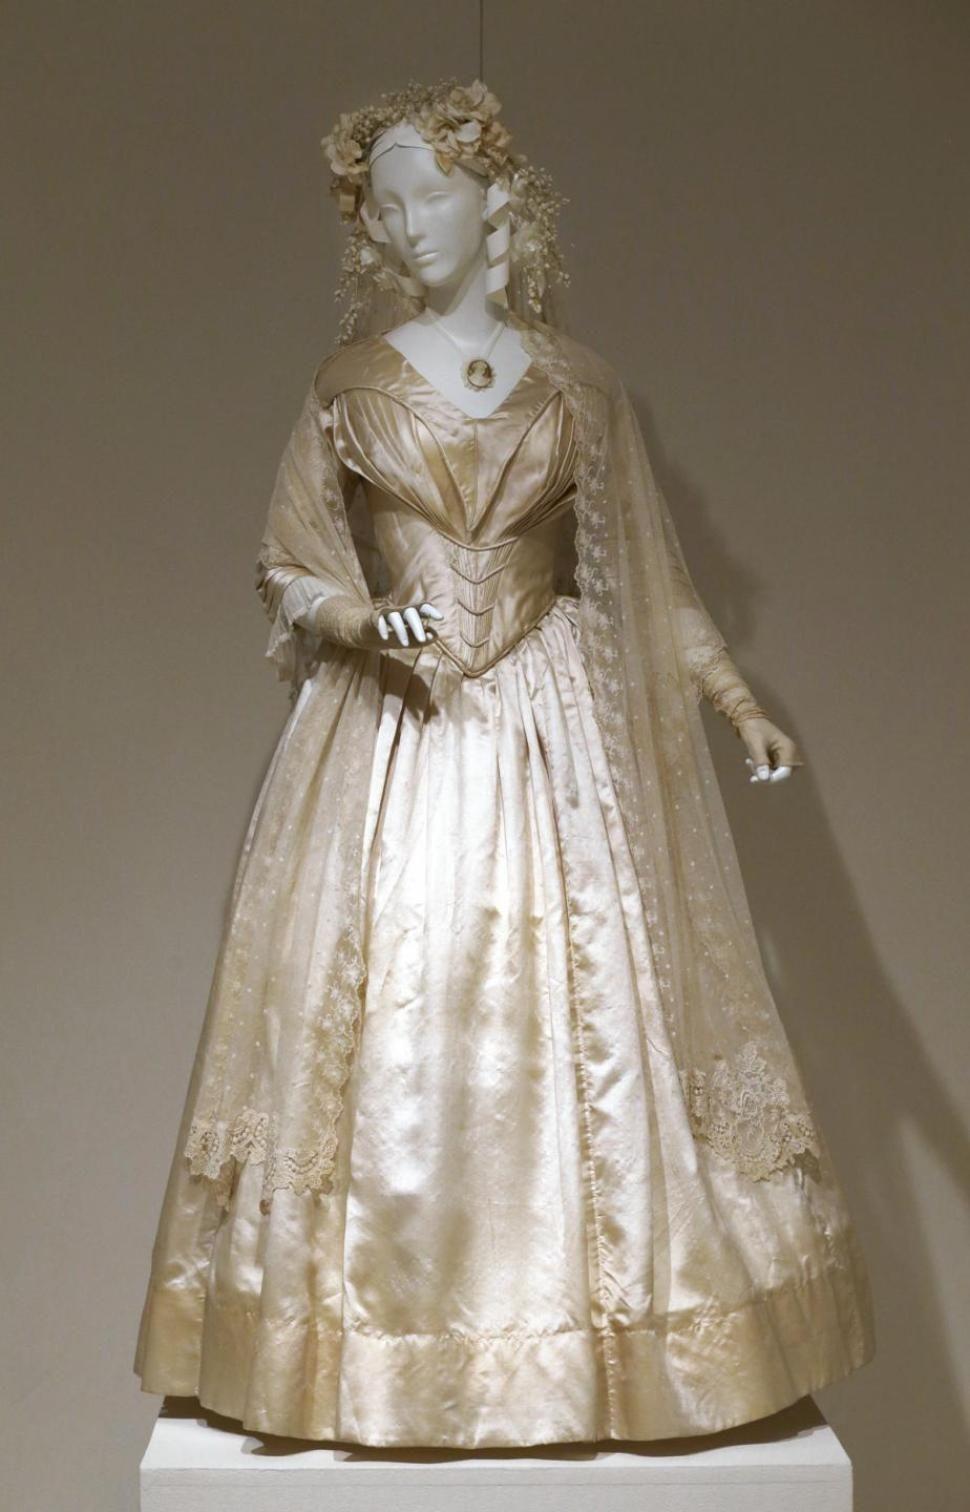 wedding dress Vintage Wedding Dresses s Design Basic 9 On Cake Wedding Ideas